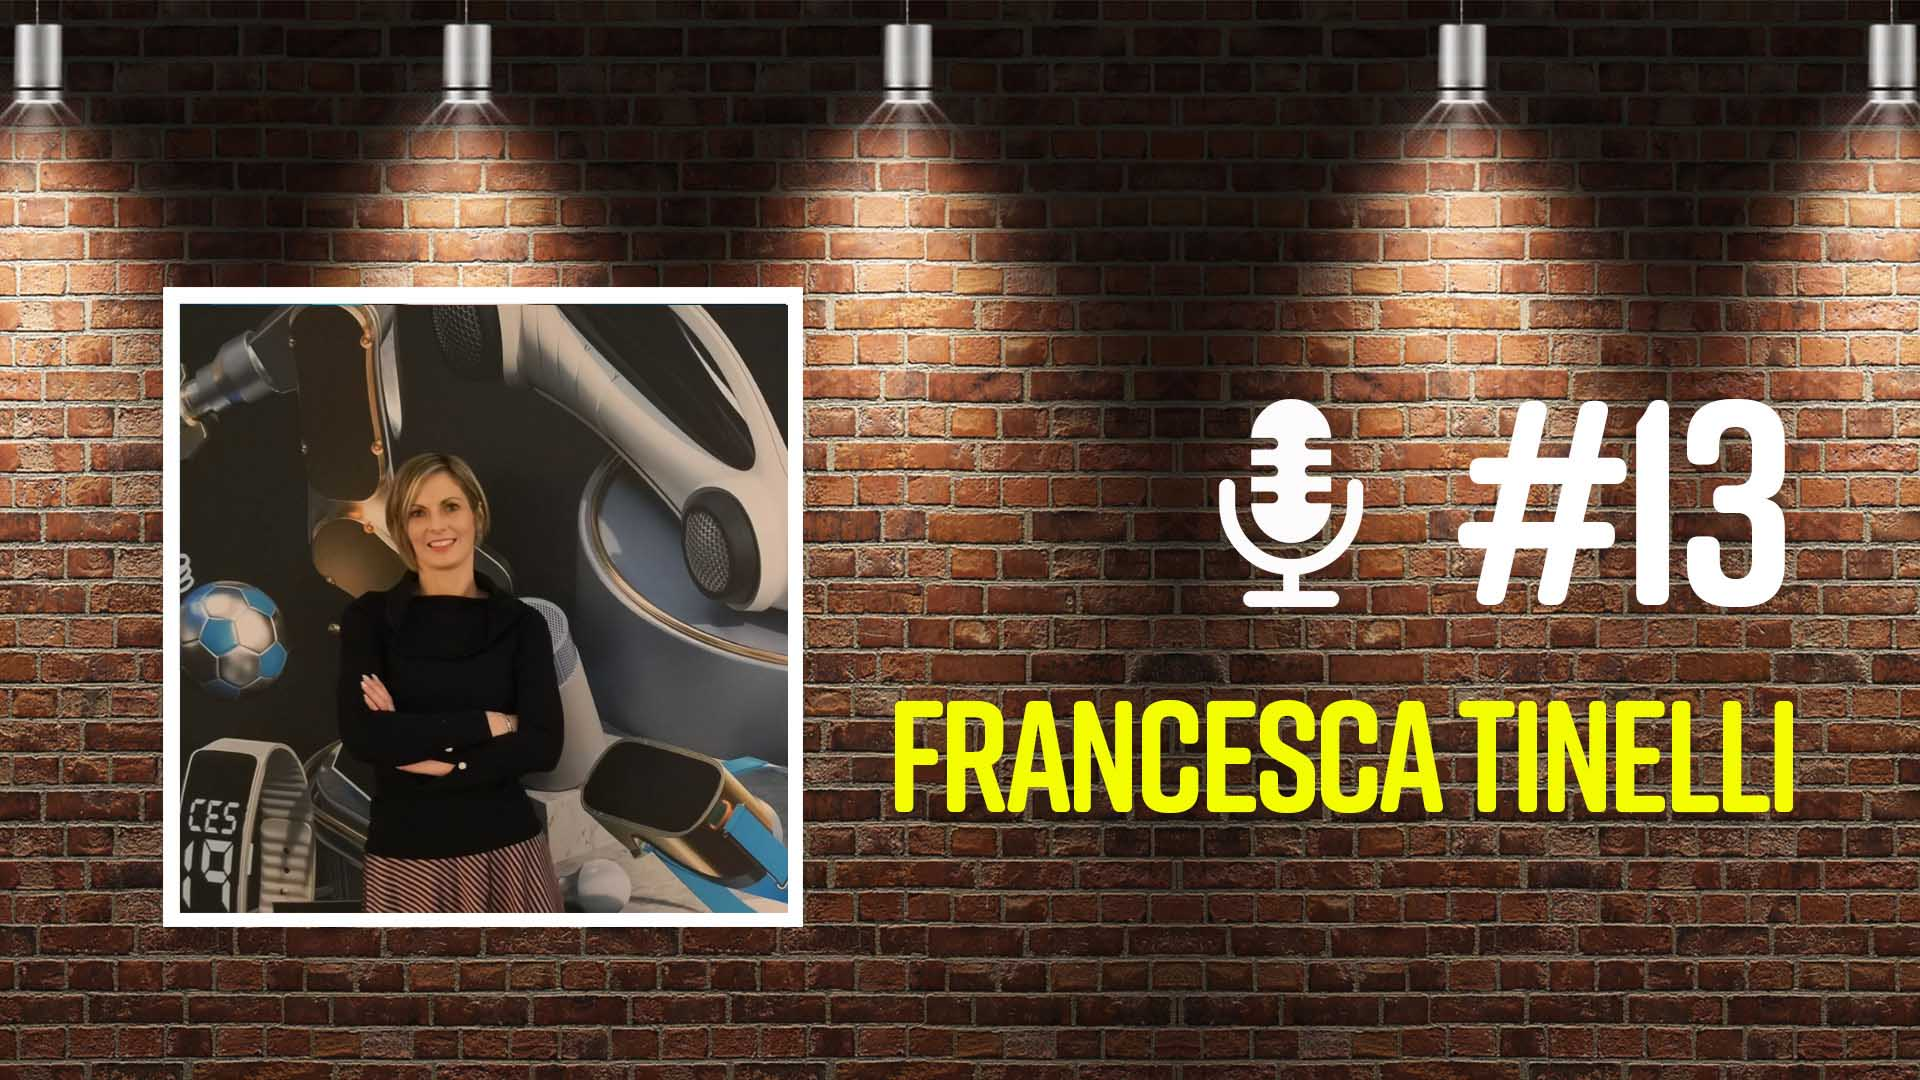 intervista francesca tinelli